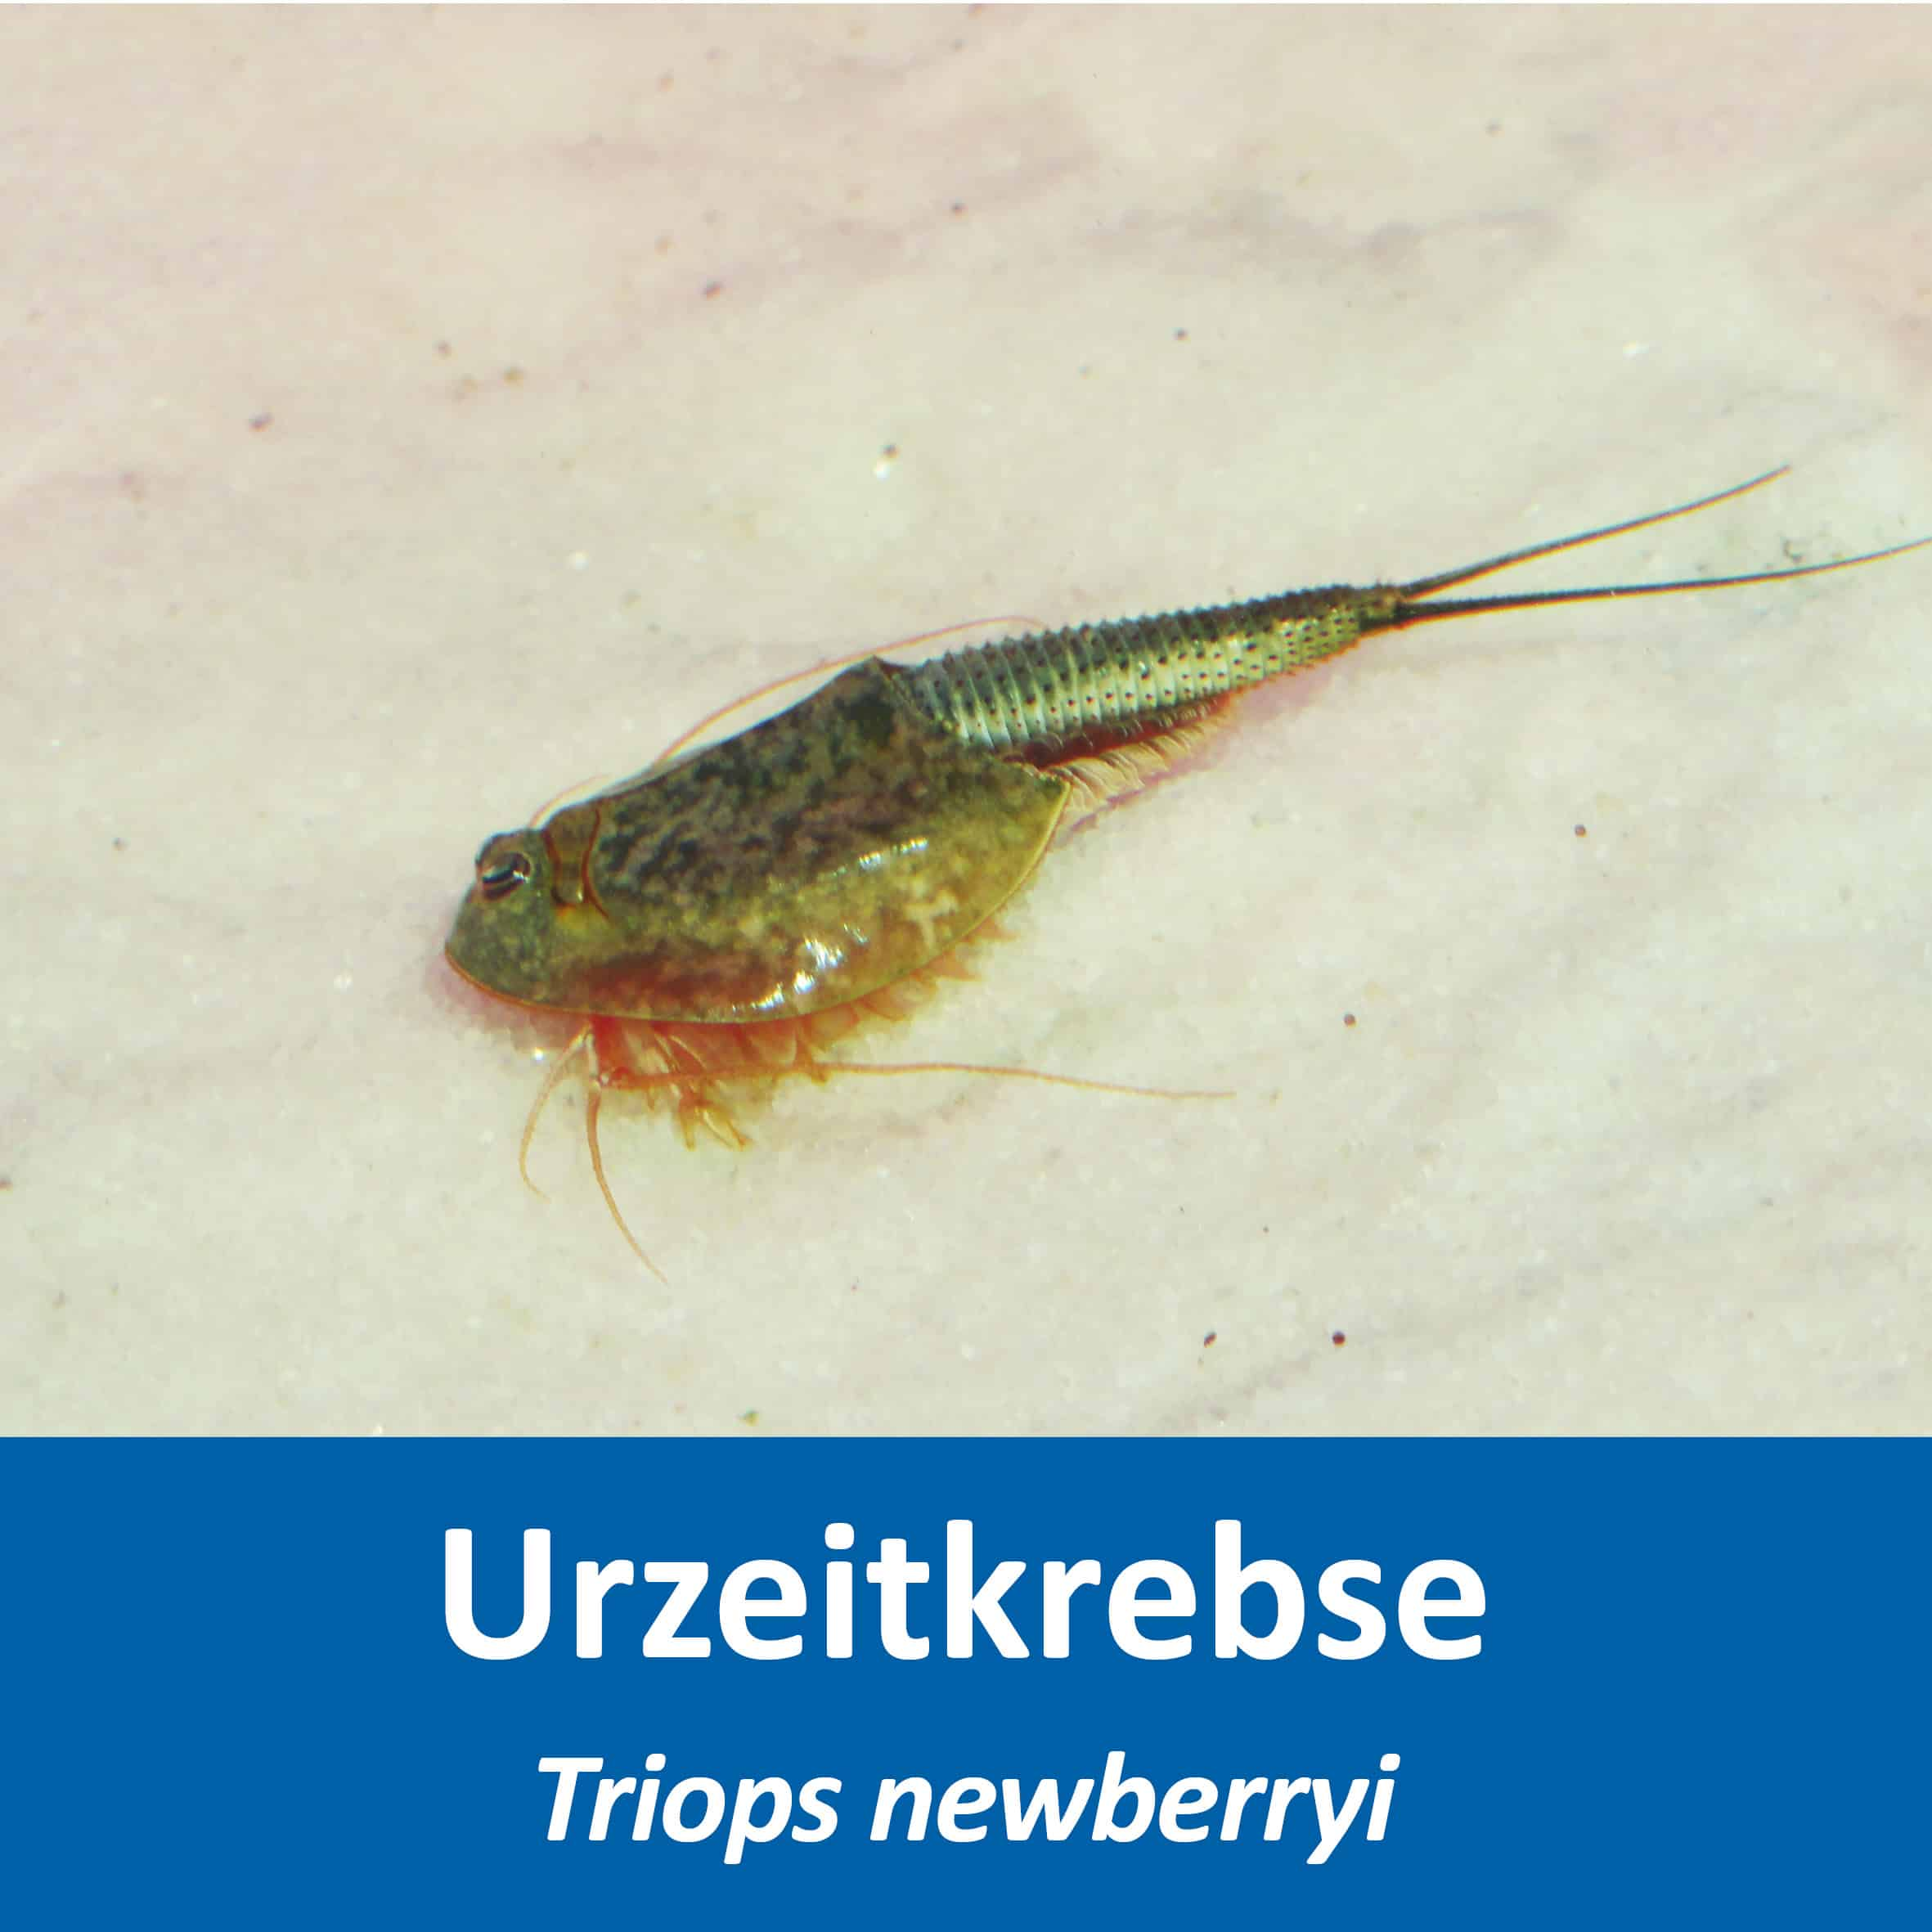 Triops newberryi